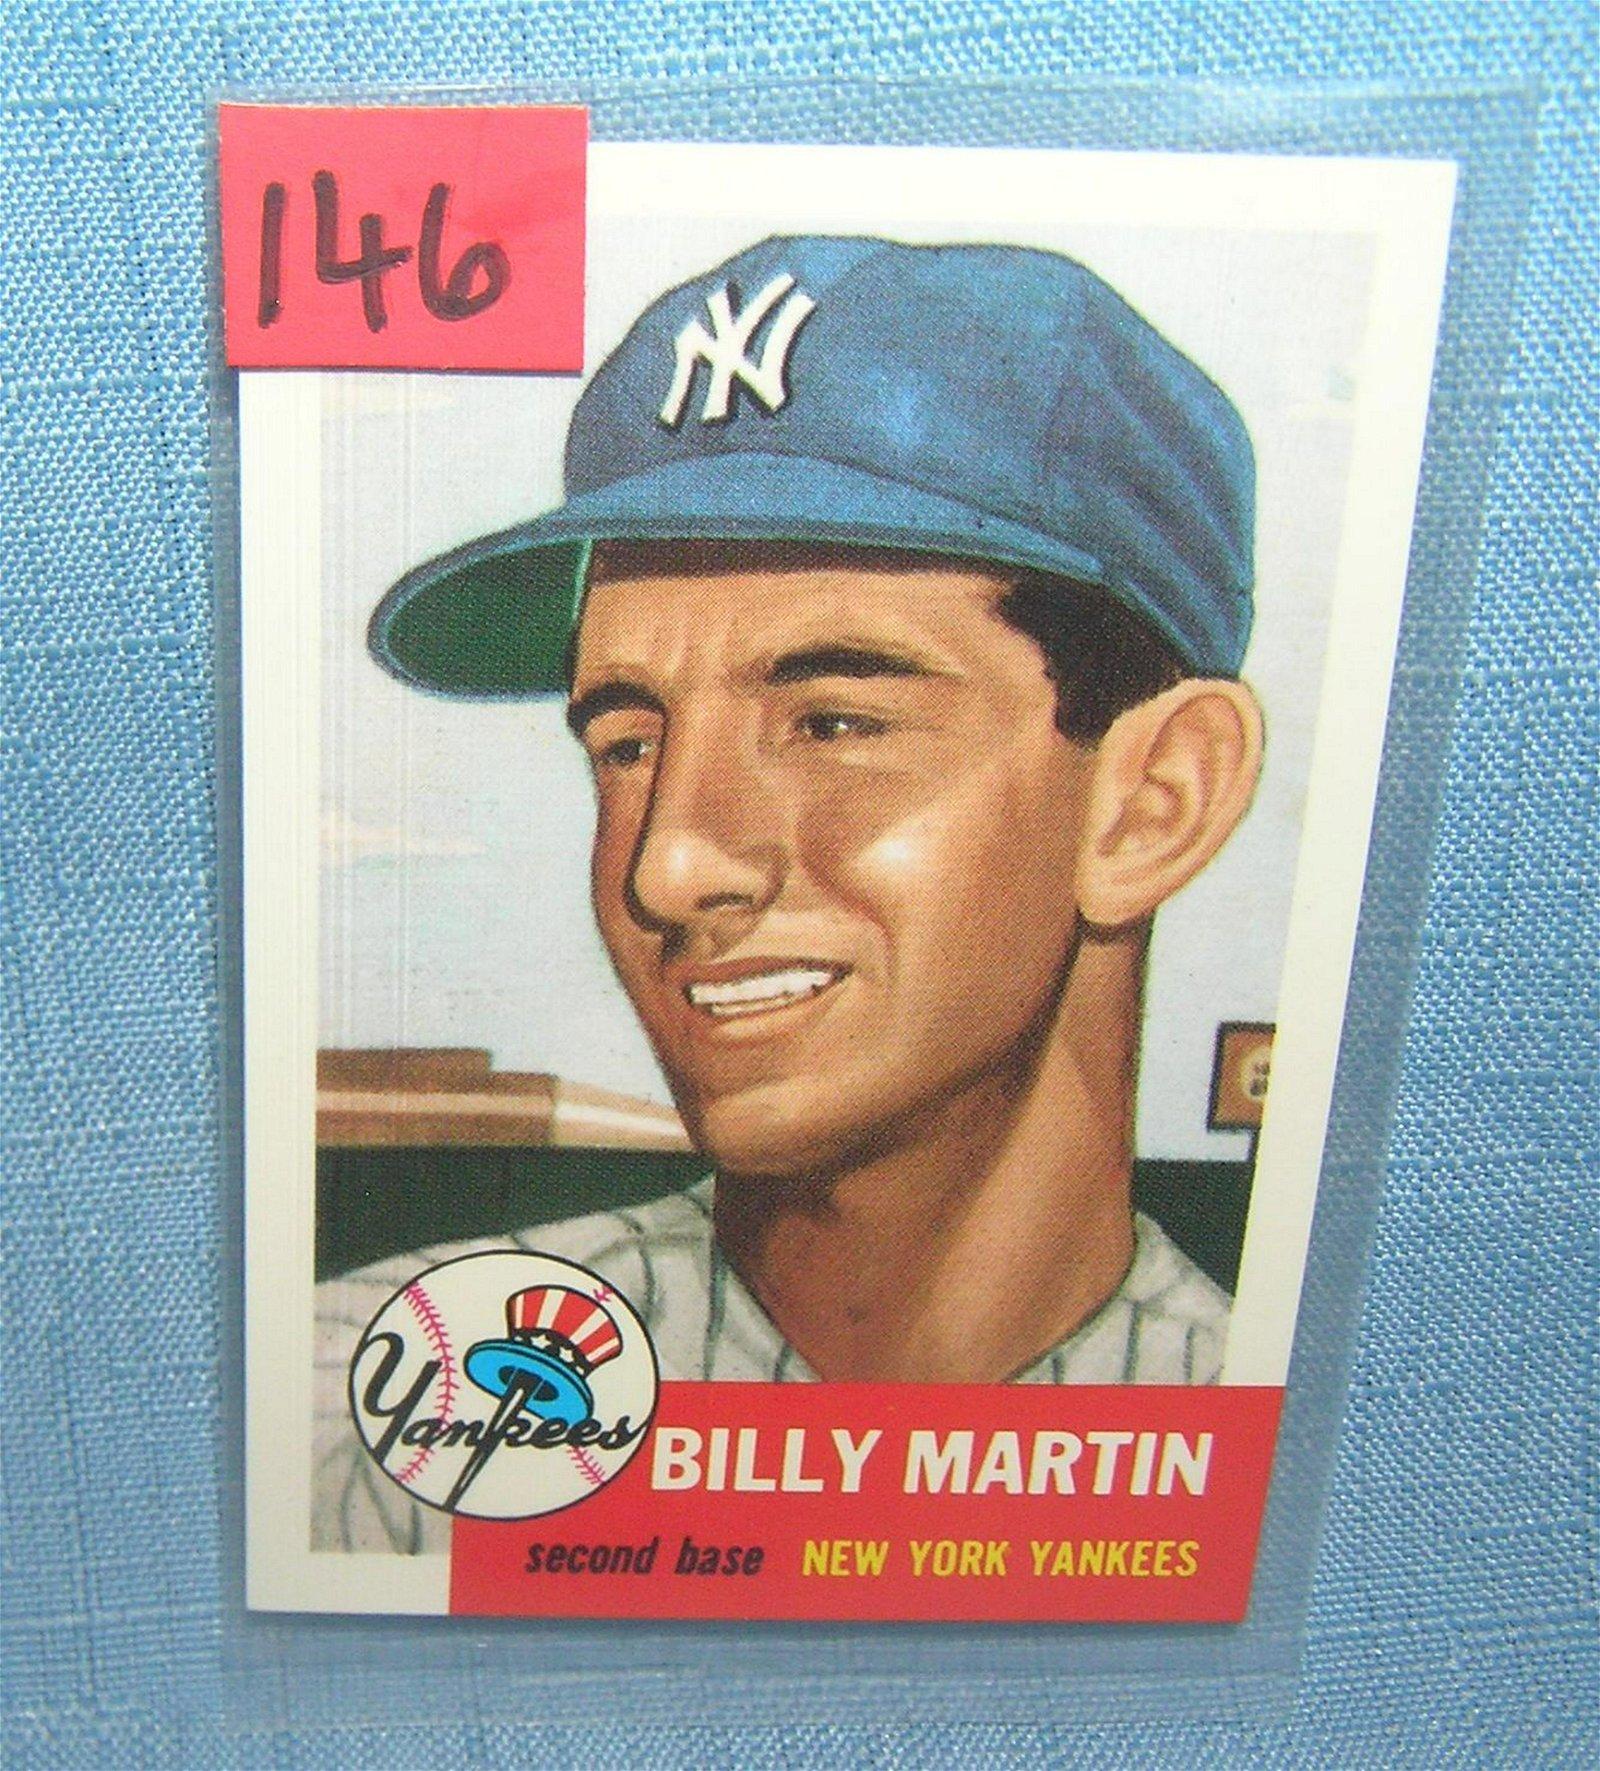 Billy Martin All Star Retro Baseball Card Aug 16 2019